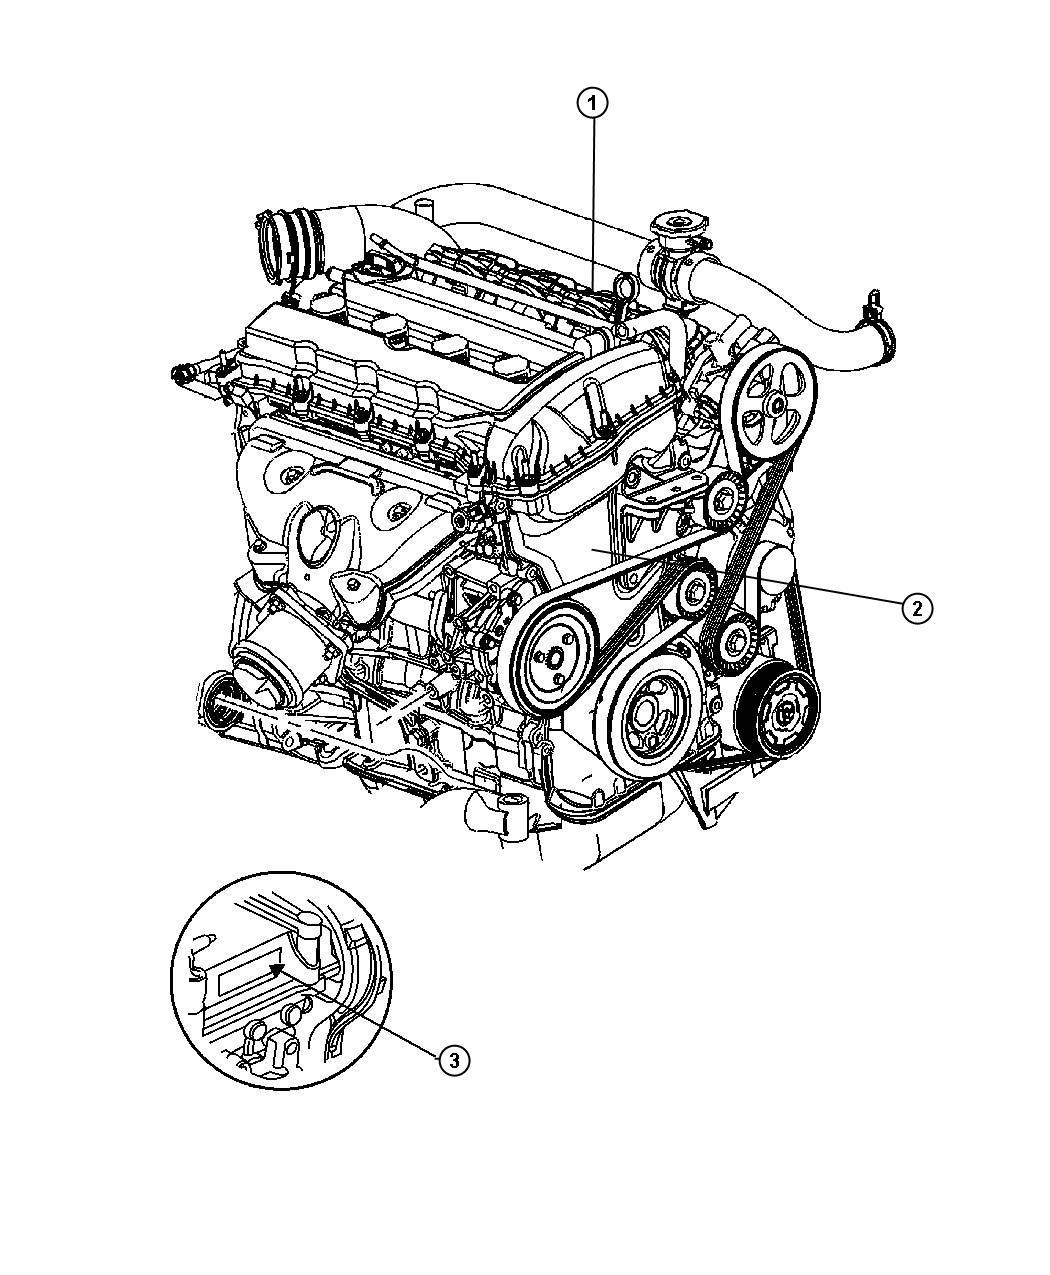 Dodge Caliber Engine Long Block Remanufactured Engine